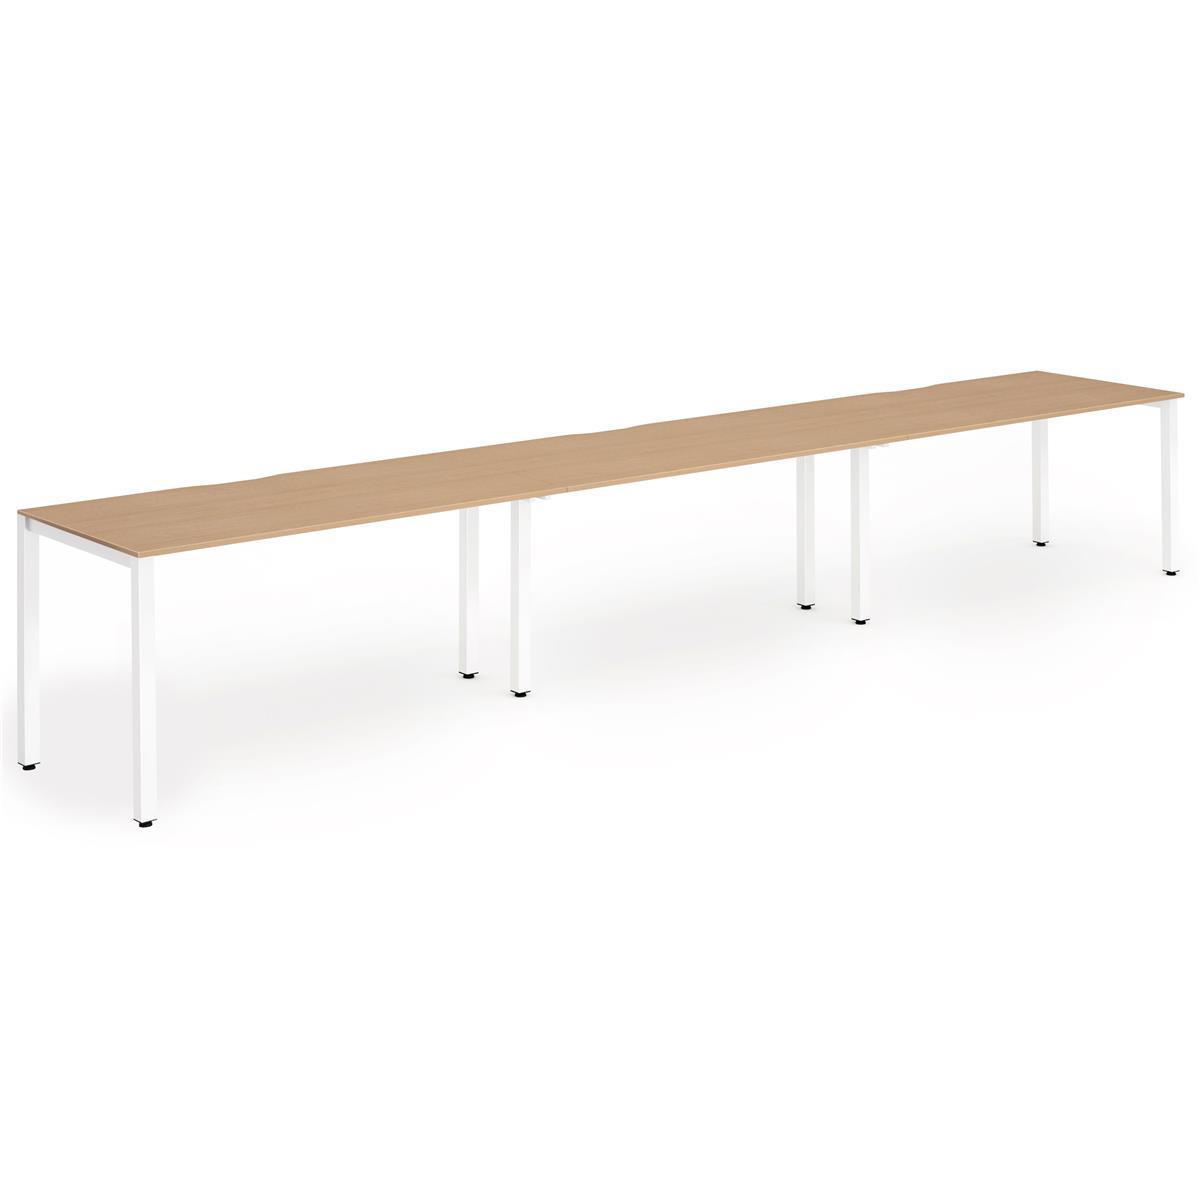 Trexus Bench Desk 3 Person Side to Side Configuration White Leg 3600x800mm Oak Ref BE398